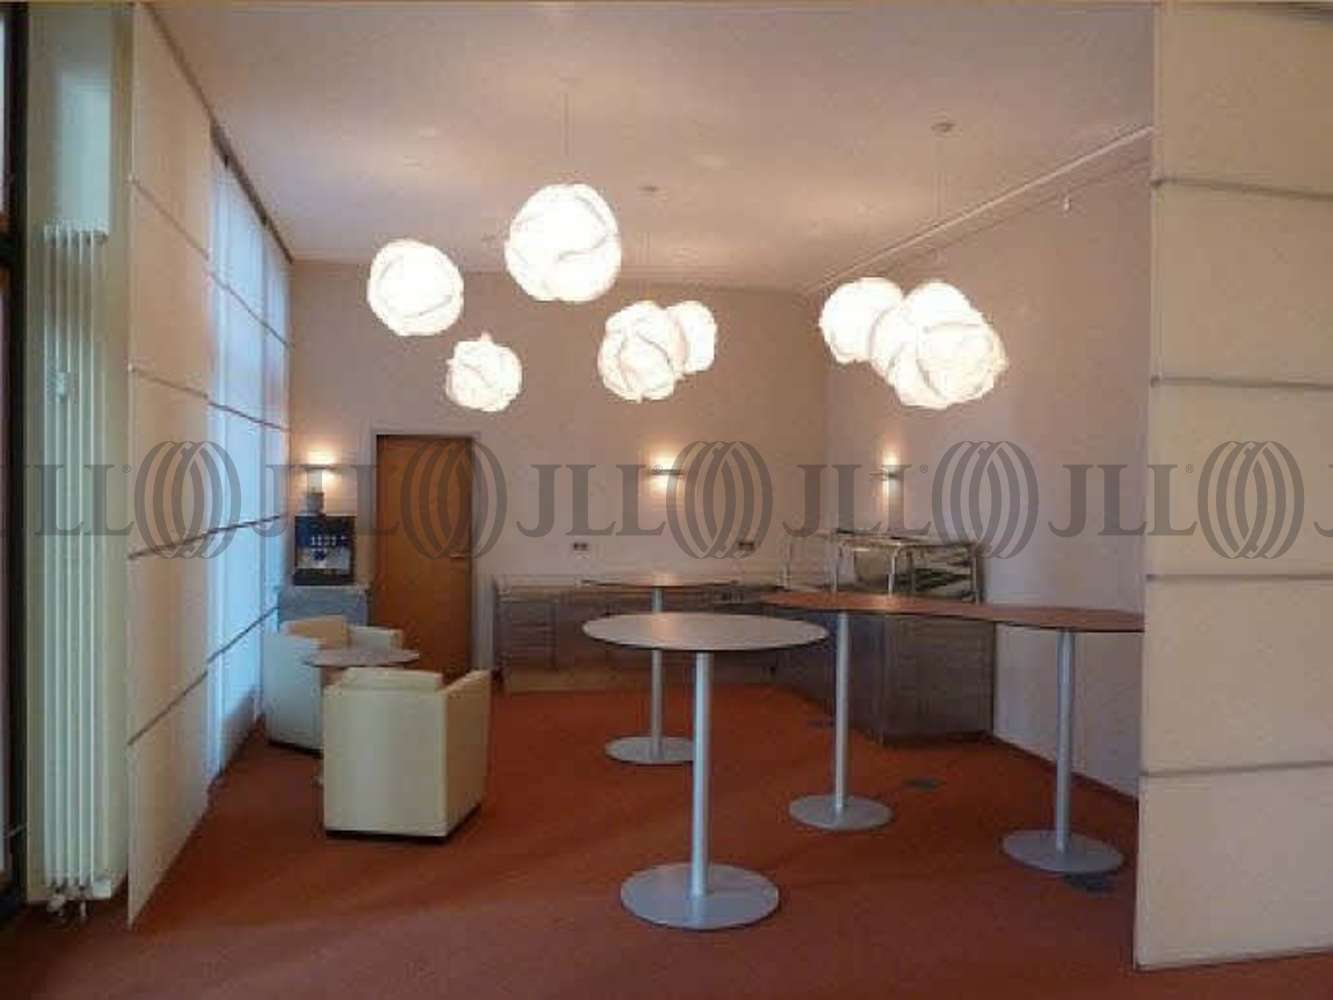 Büros Frankfurt am main, 60439 - Büro - Frankfurt am Main - F2276 - 10804487